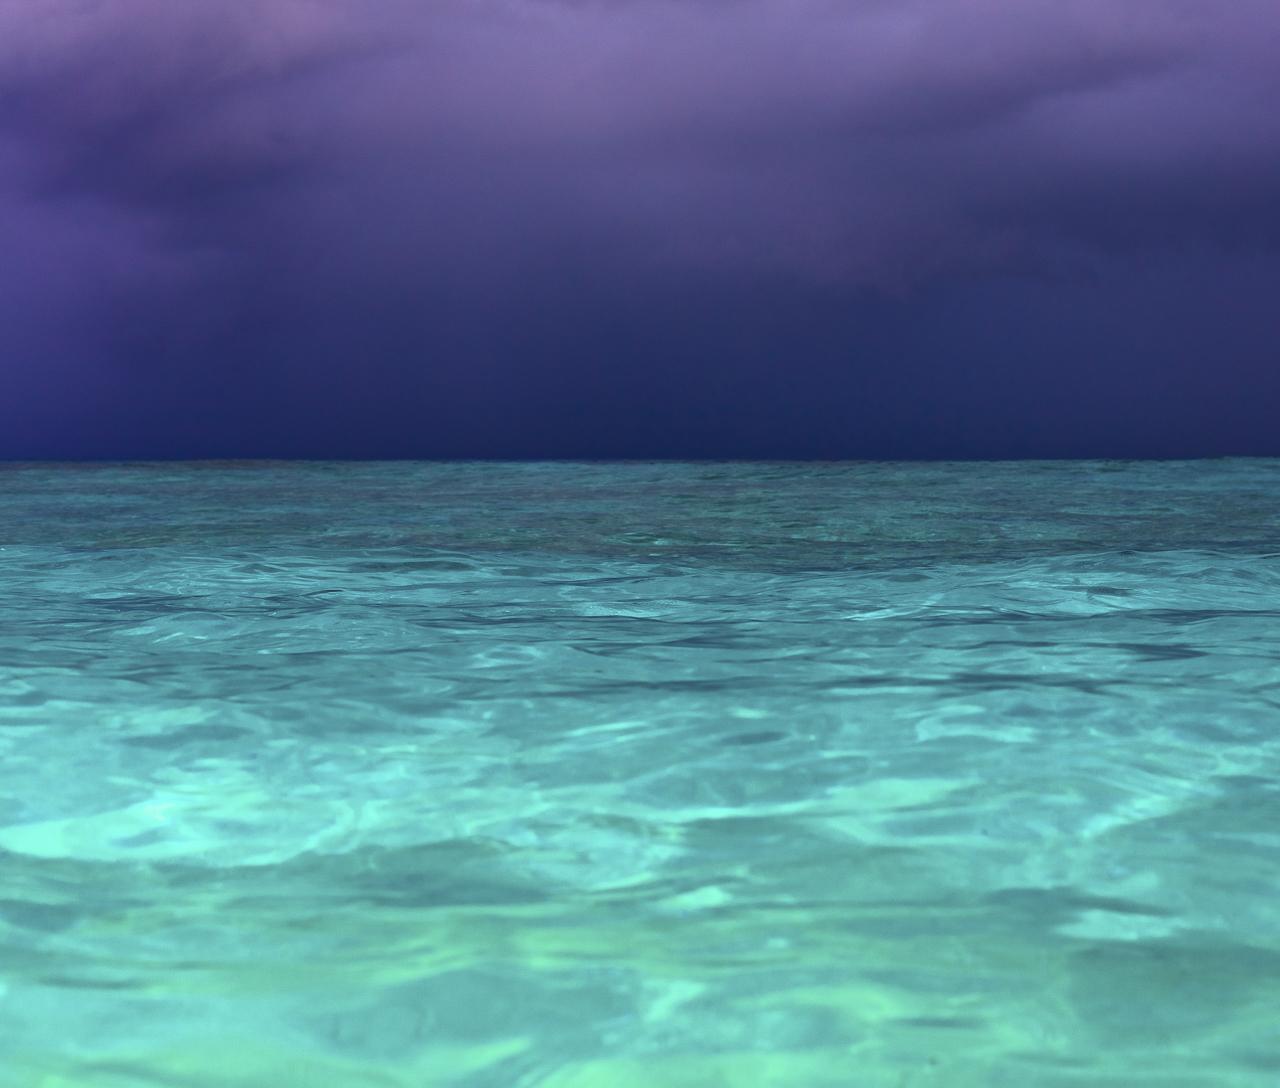 020_Sarah_Lee_Photography_Underwater_1.jpg